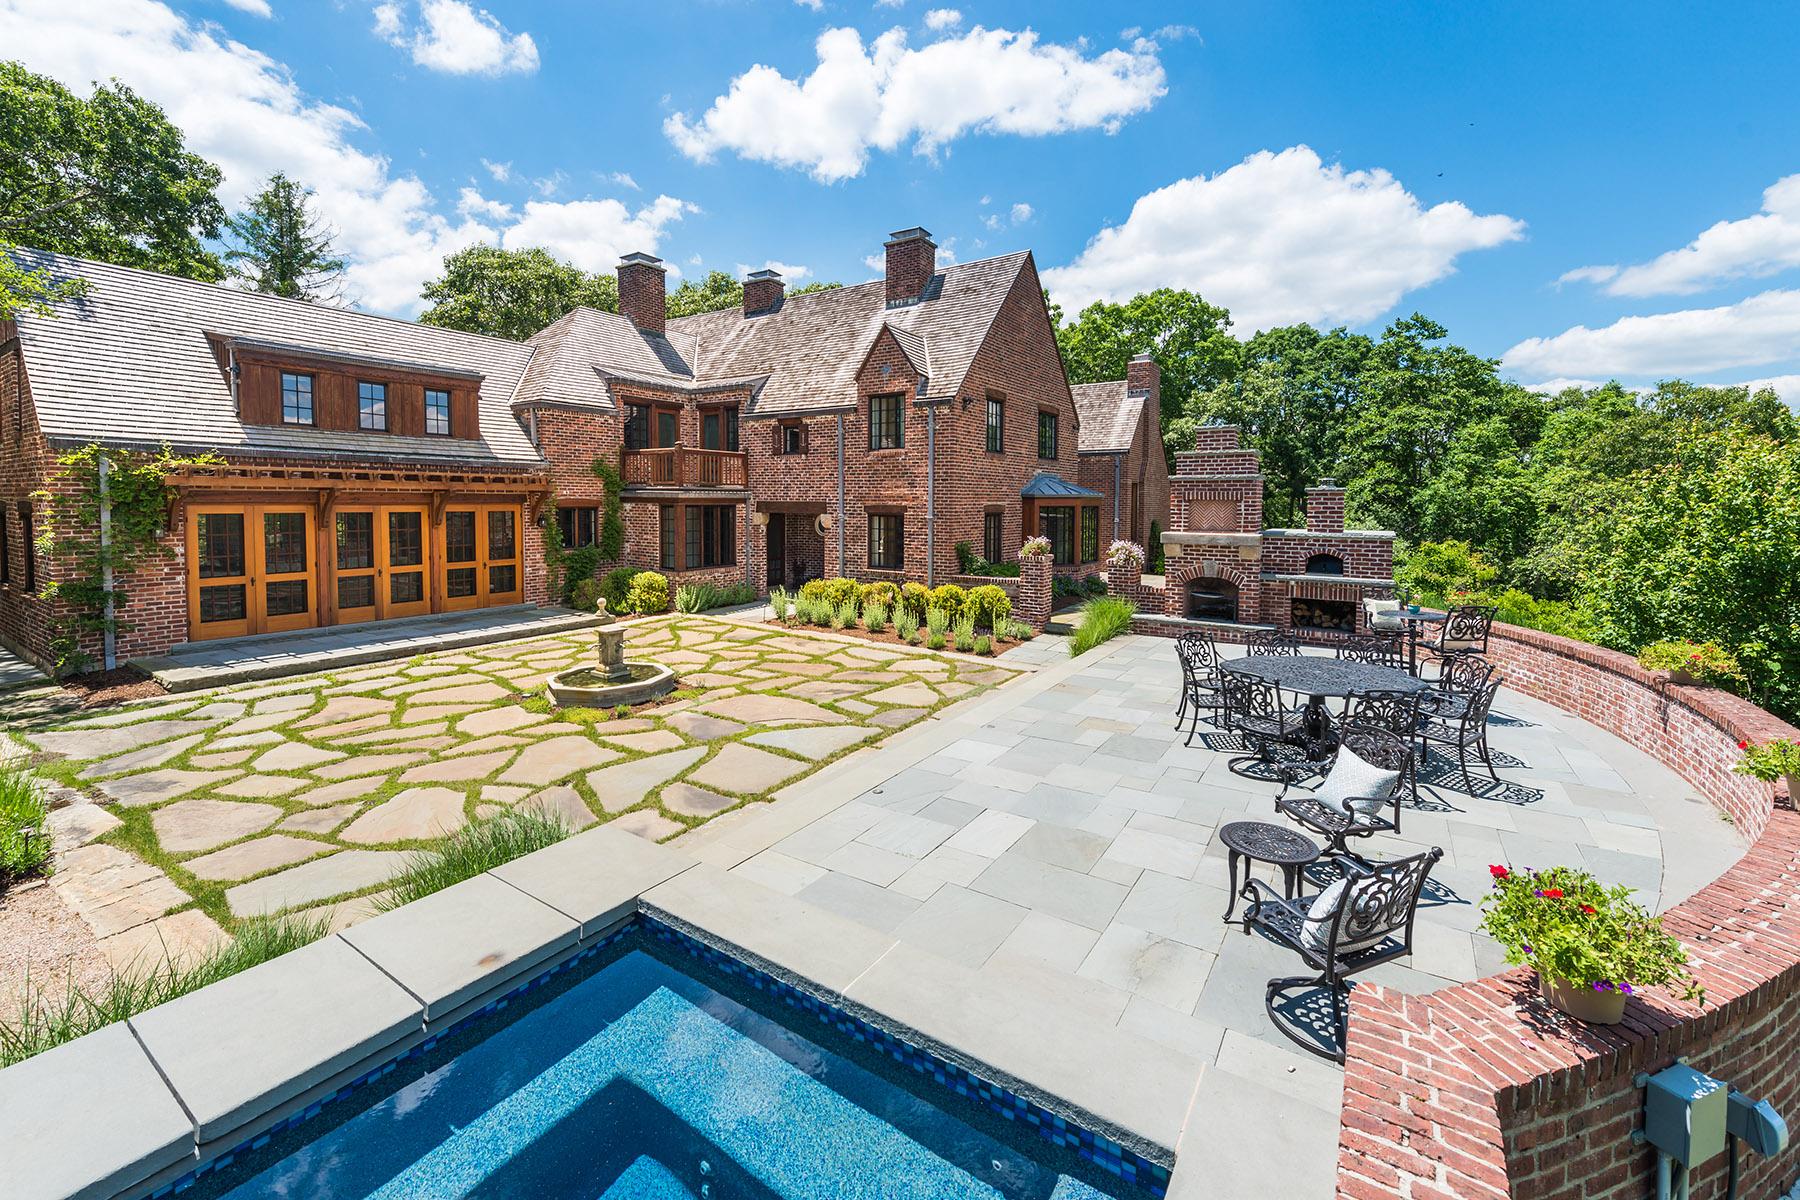 Villa per Vendita alle ore High Point 91 - 89B South Arnolda Road Charlestown, Rhode Island 02813 Stati Uniti